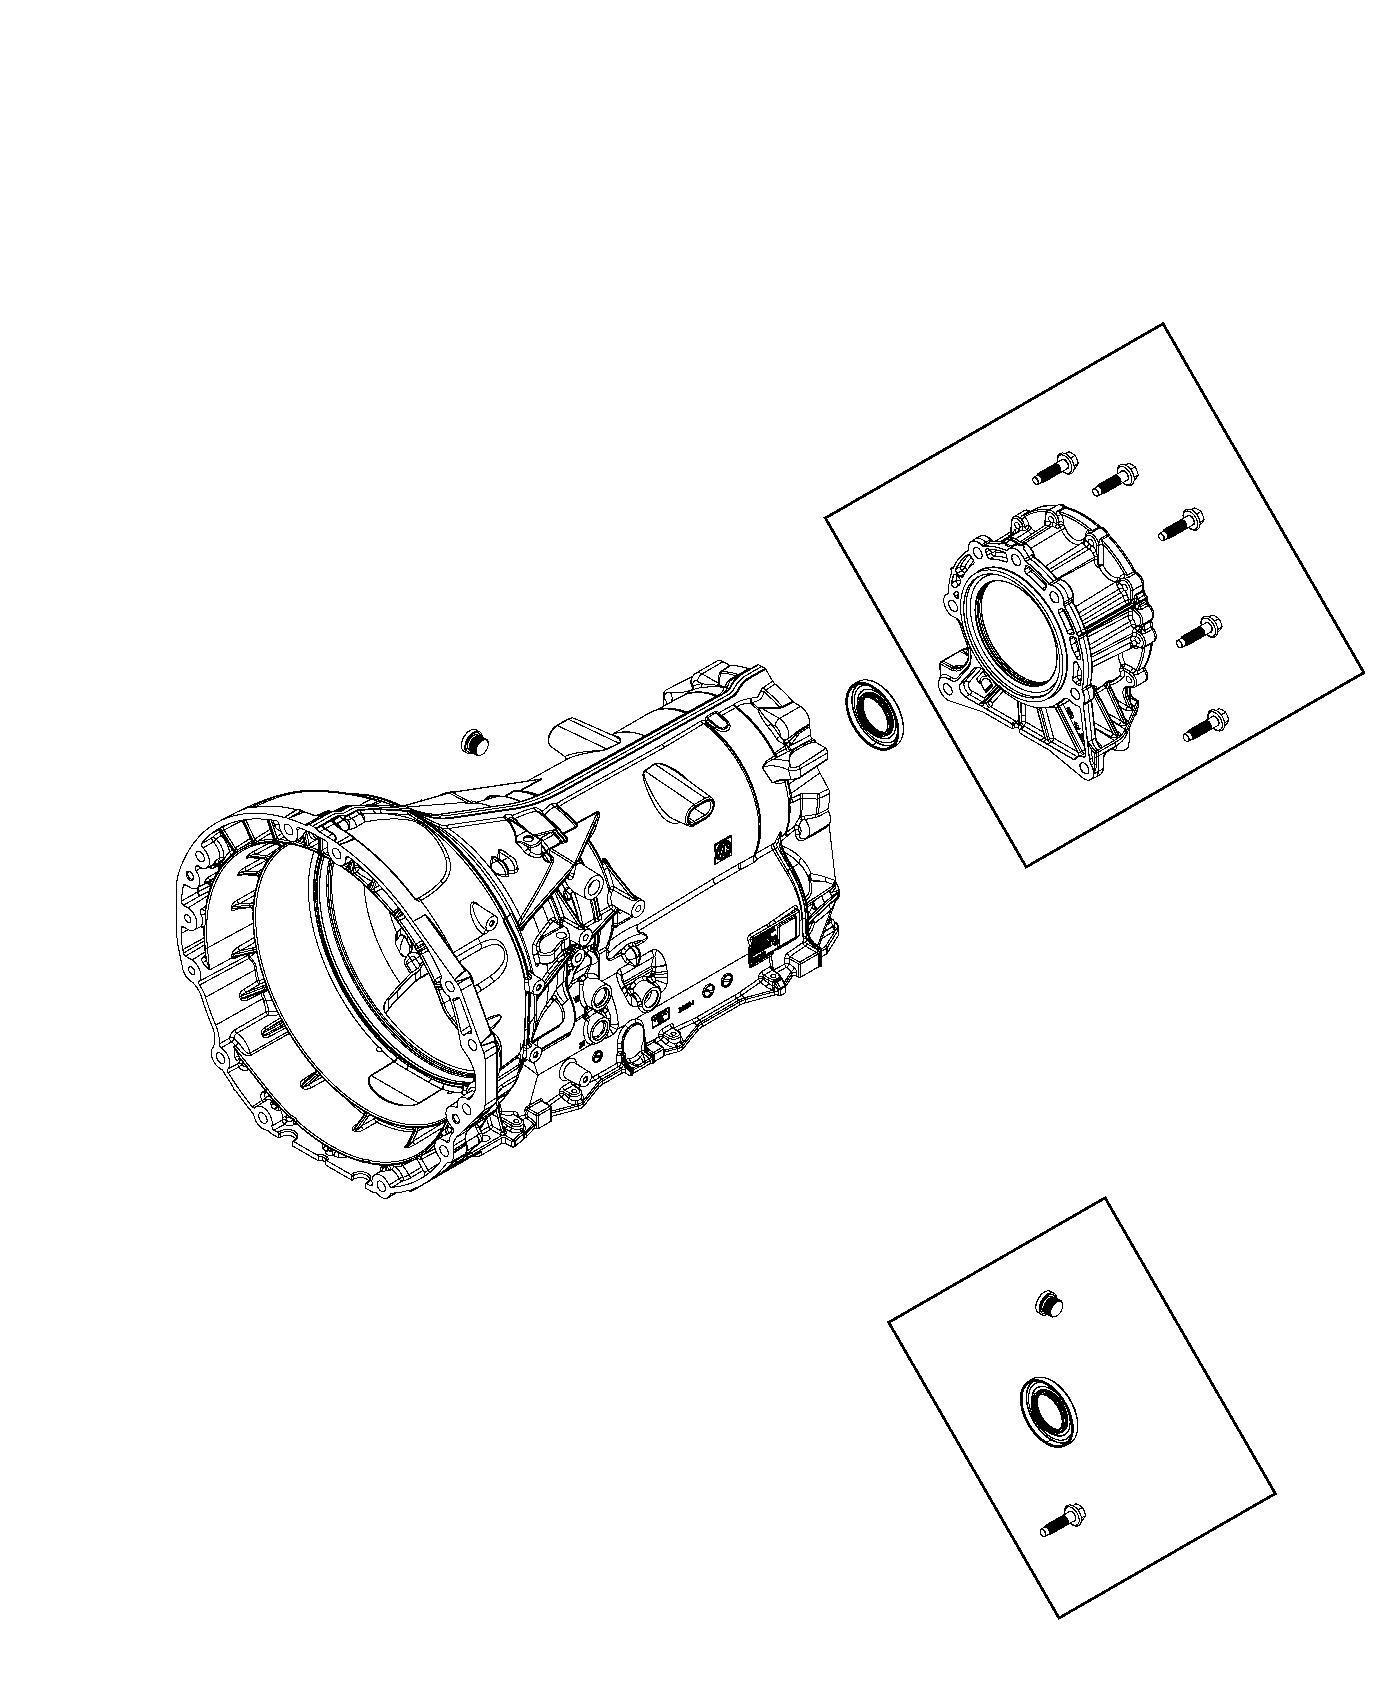 Ram Adapter Transfer Case 3 21 Rear Axle Ratio